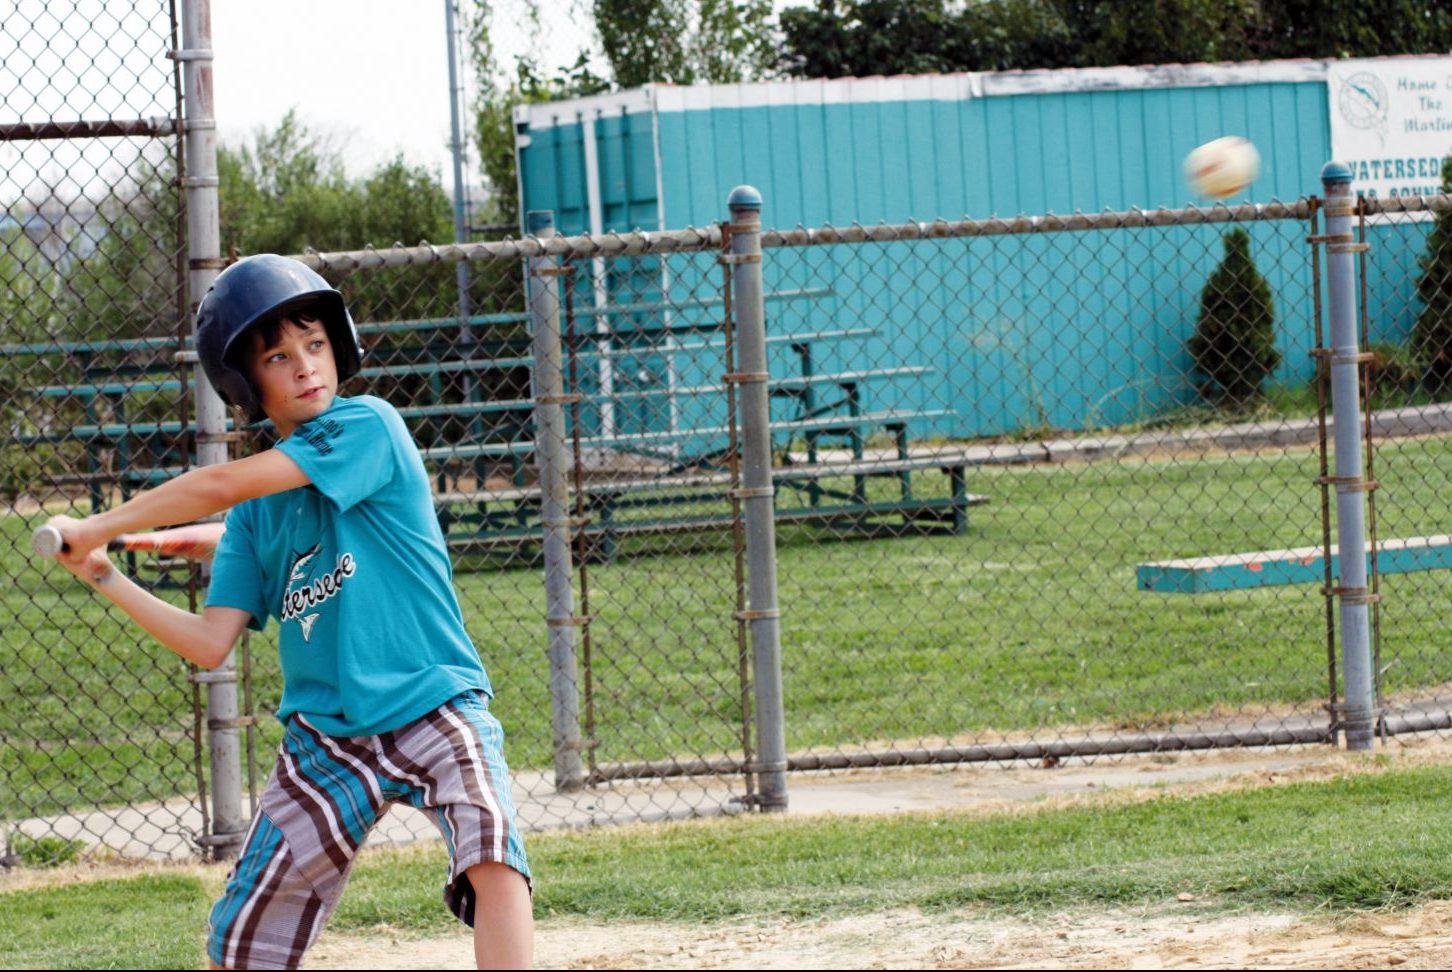 Garçon qui joue au baseball